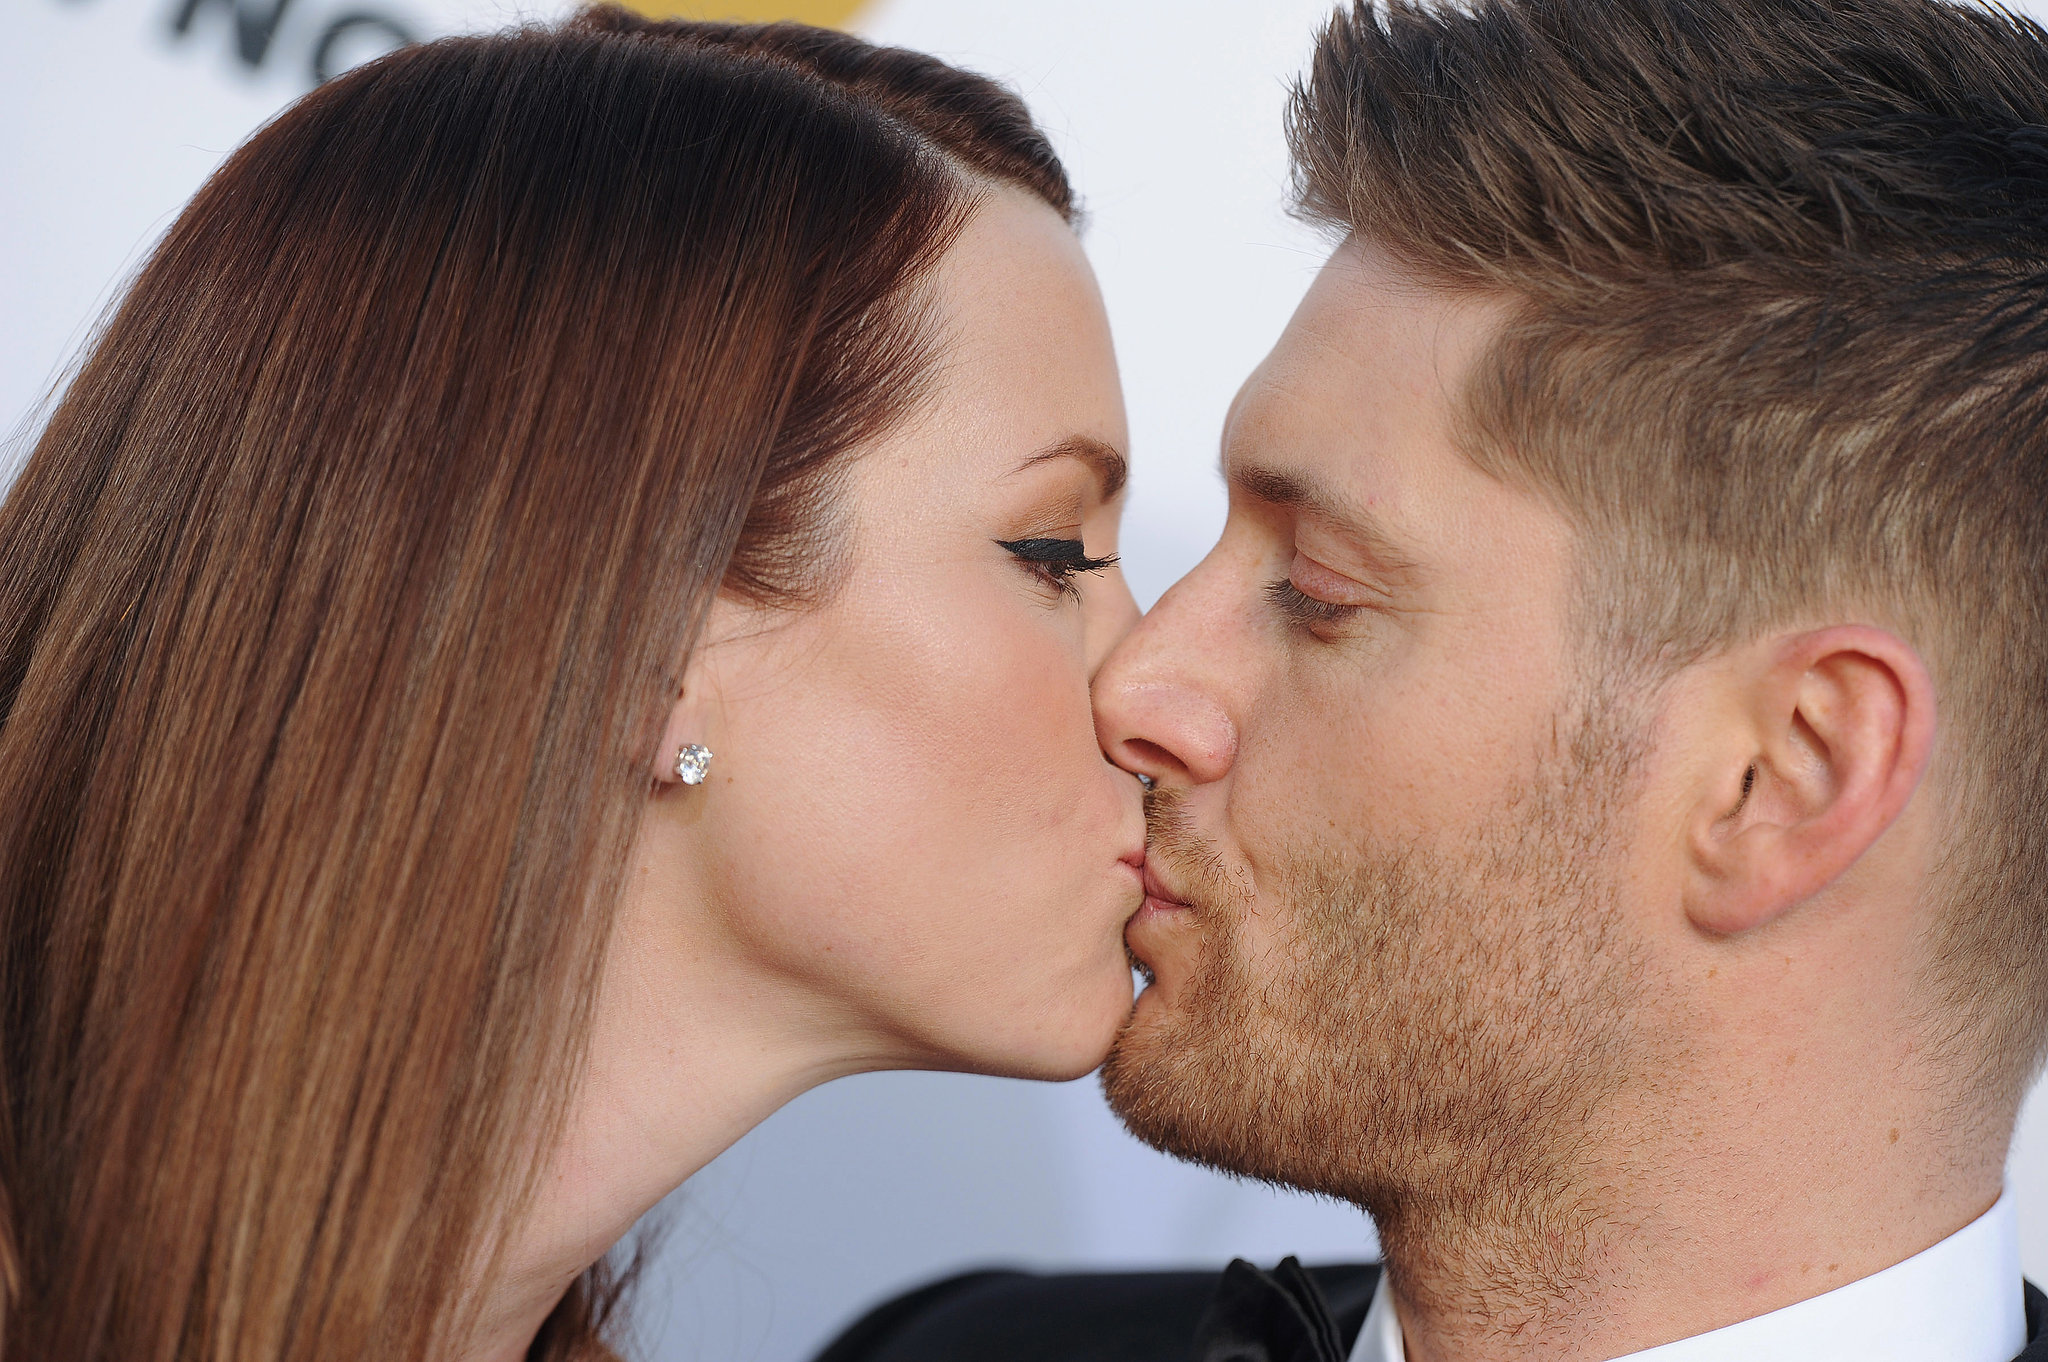 Jensen-Ackles-wife-Danneel-got-kissy-red-carpet jpgJensen Ackles Wife